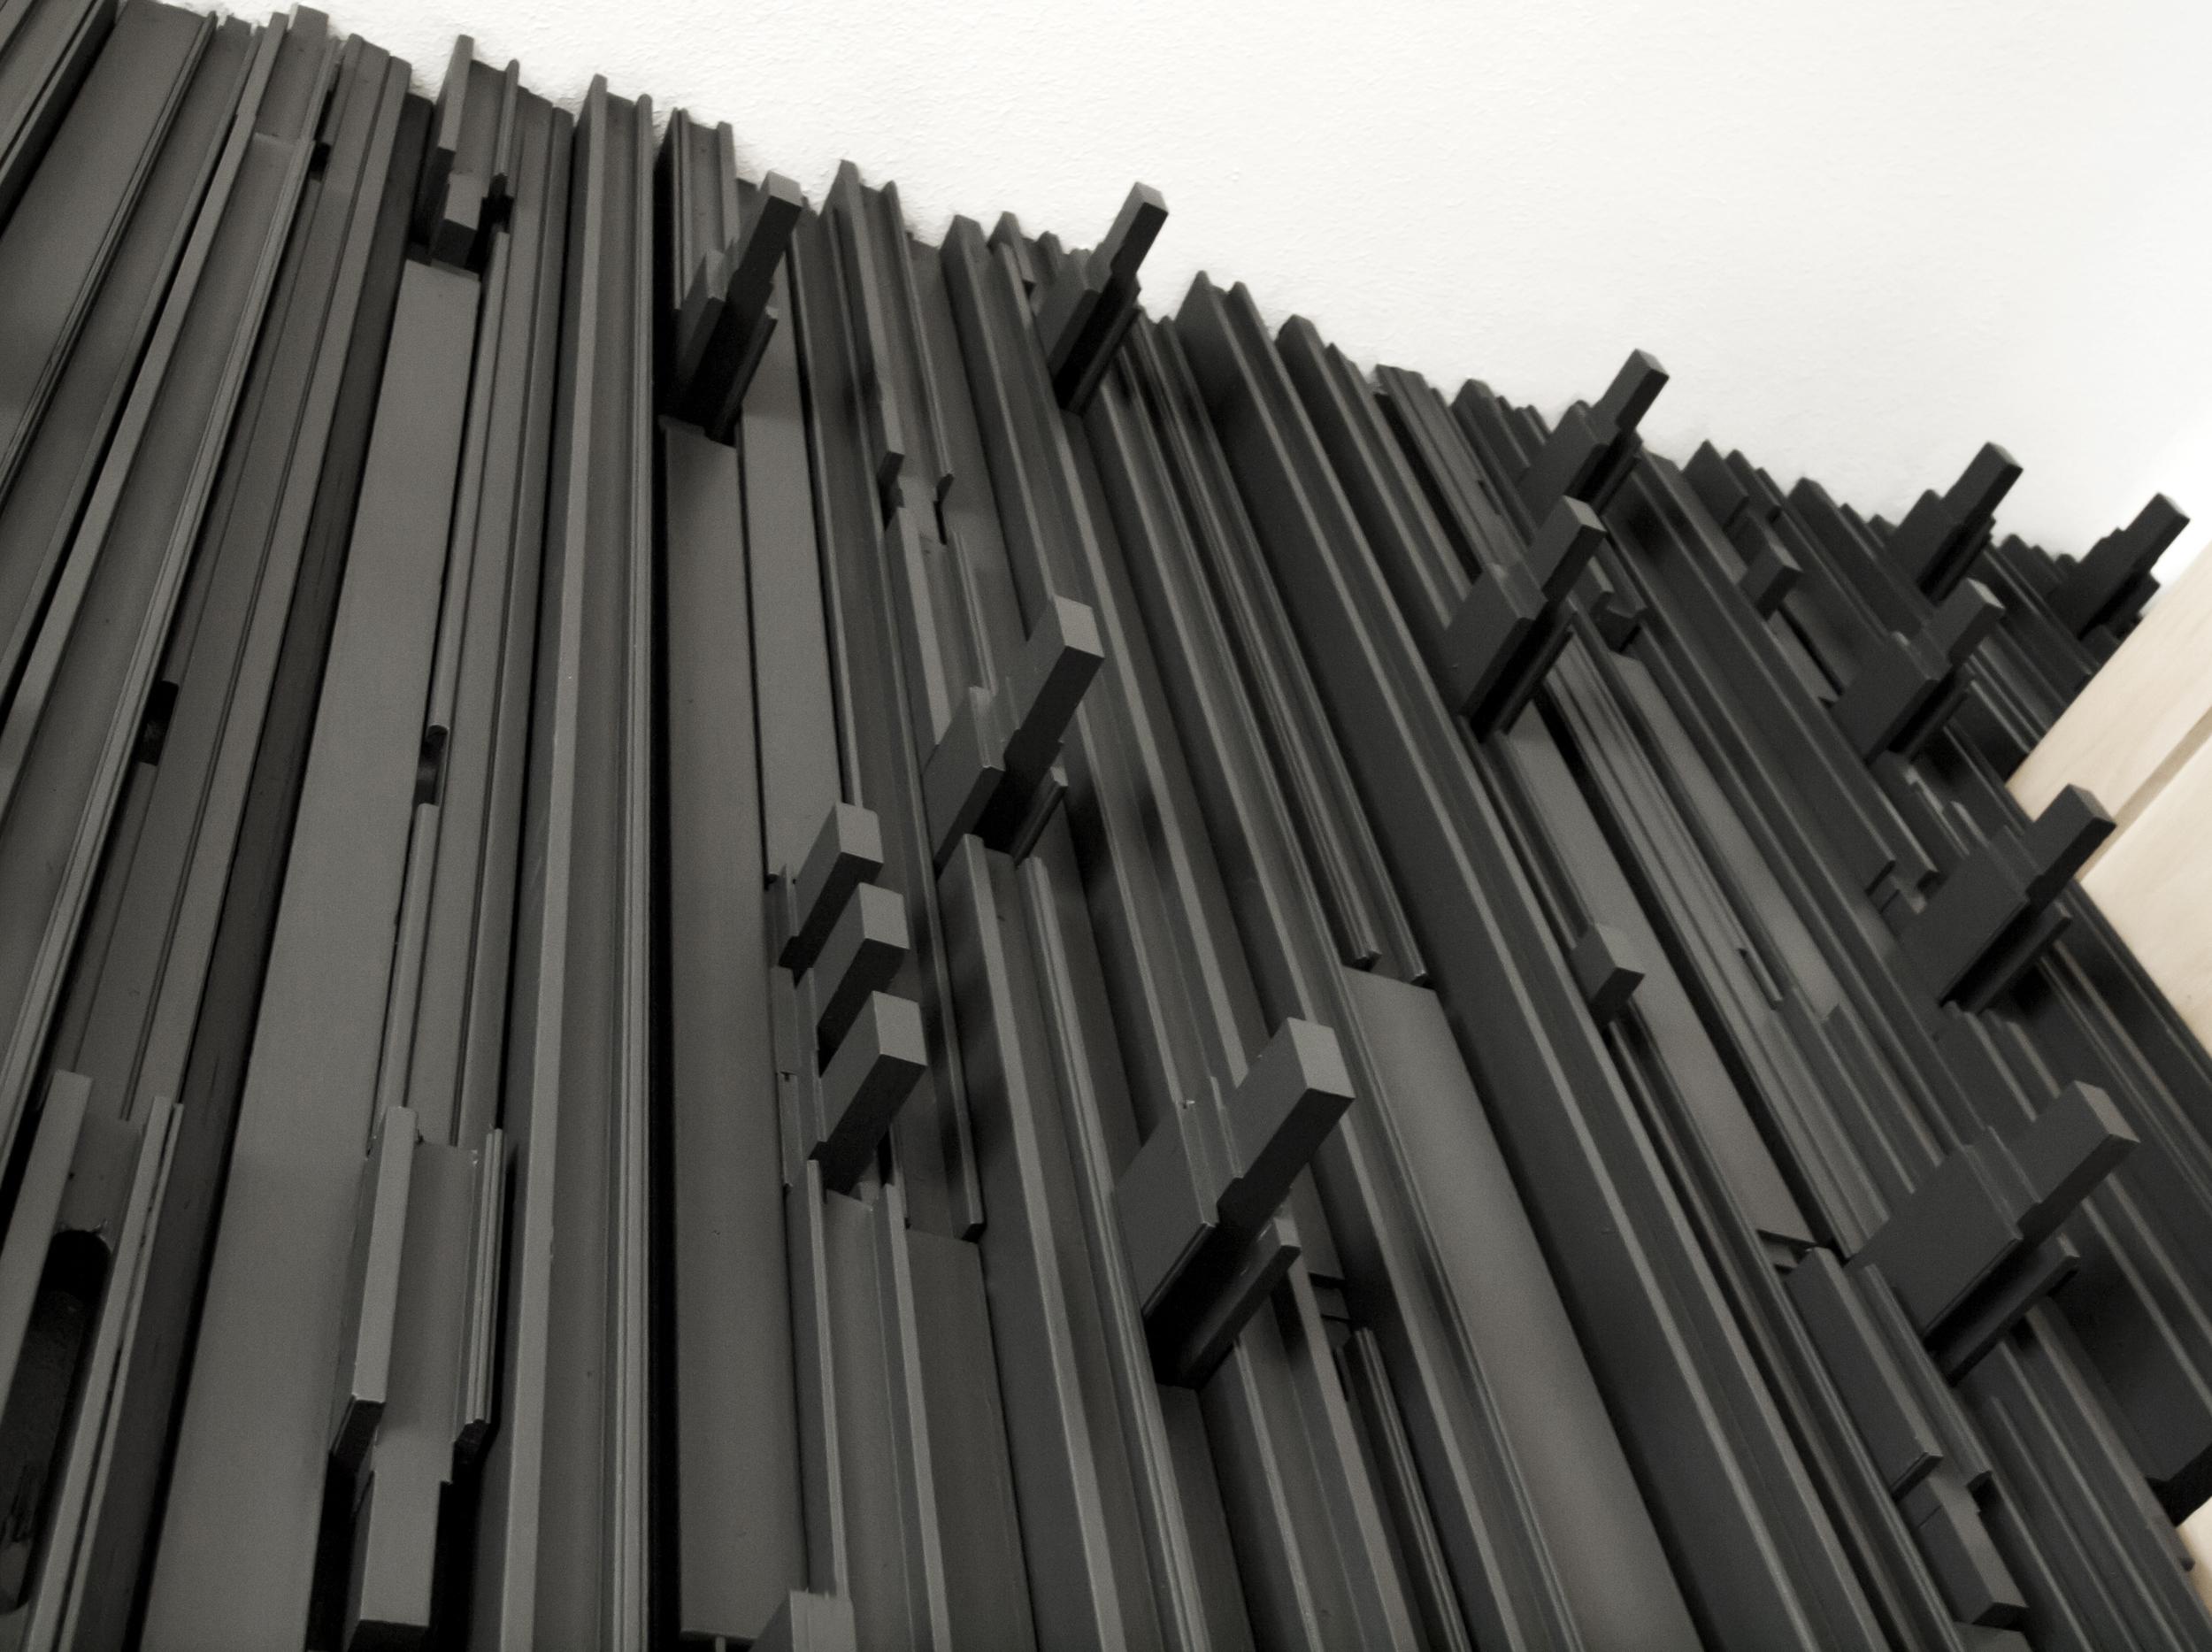 liv wood wall 04.jpg